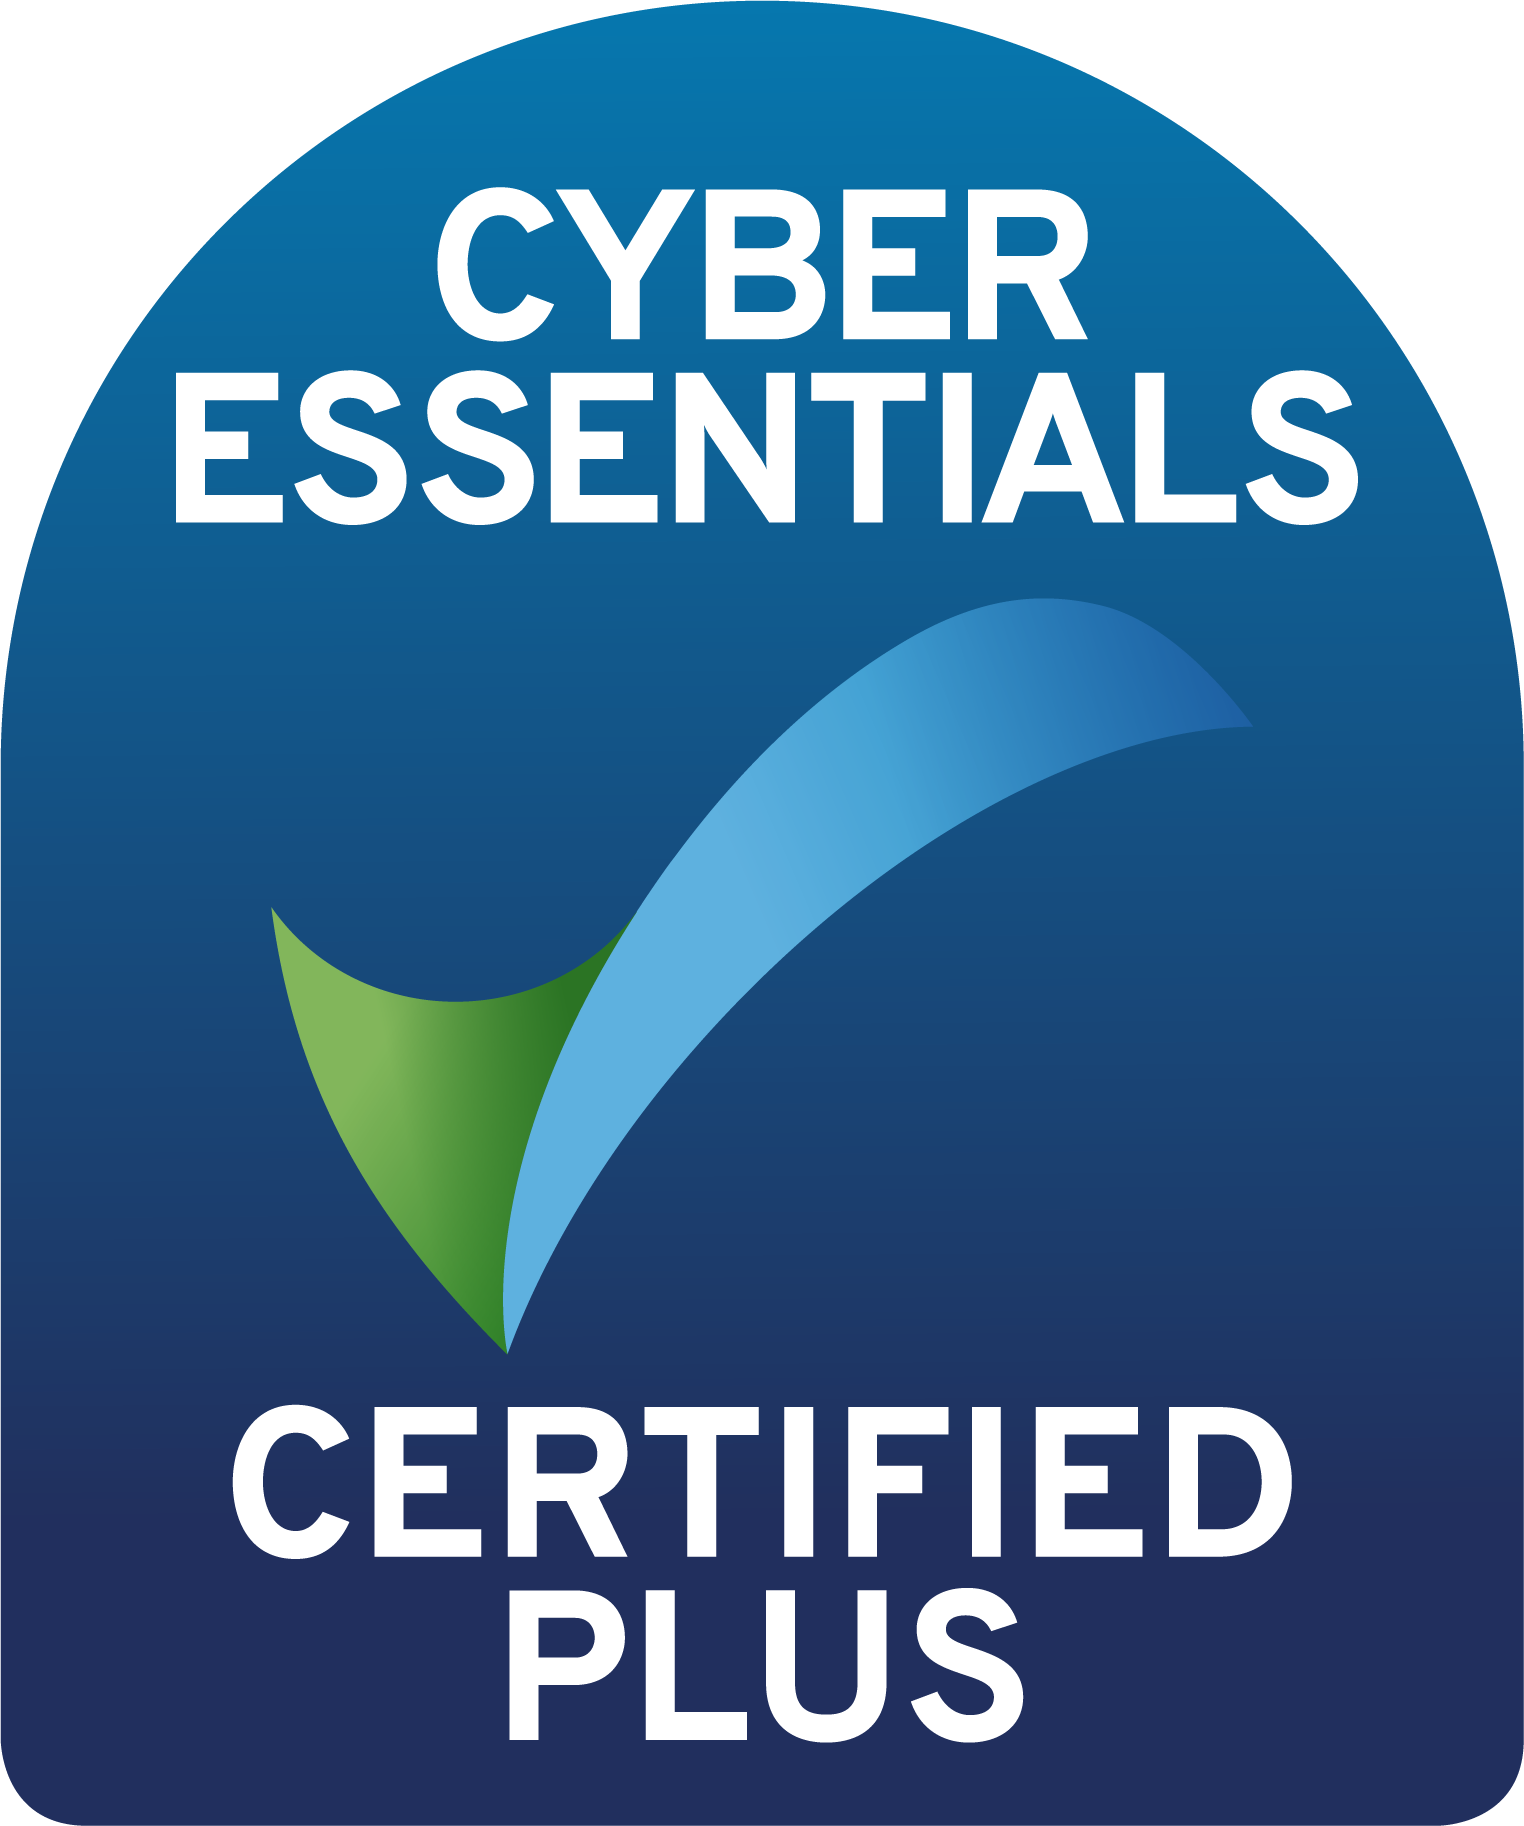 cyberessentials_certification_mark_plus_colour